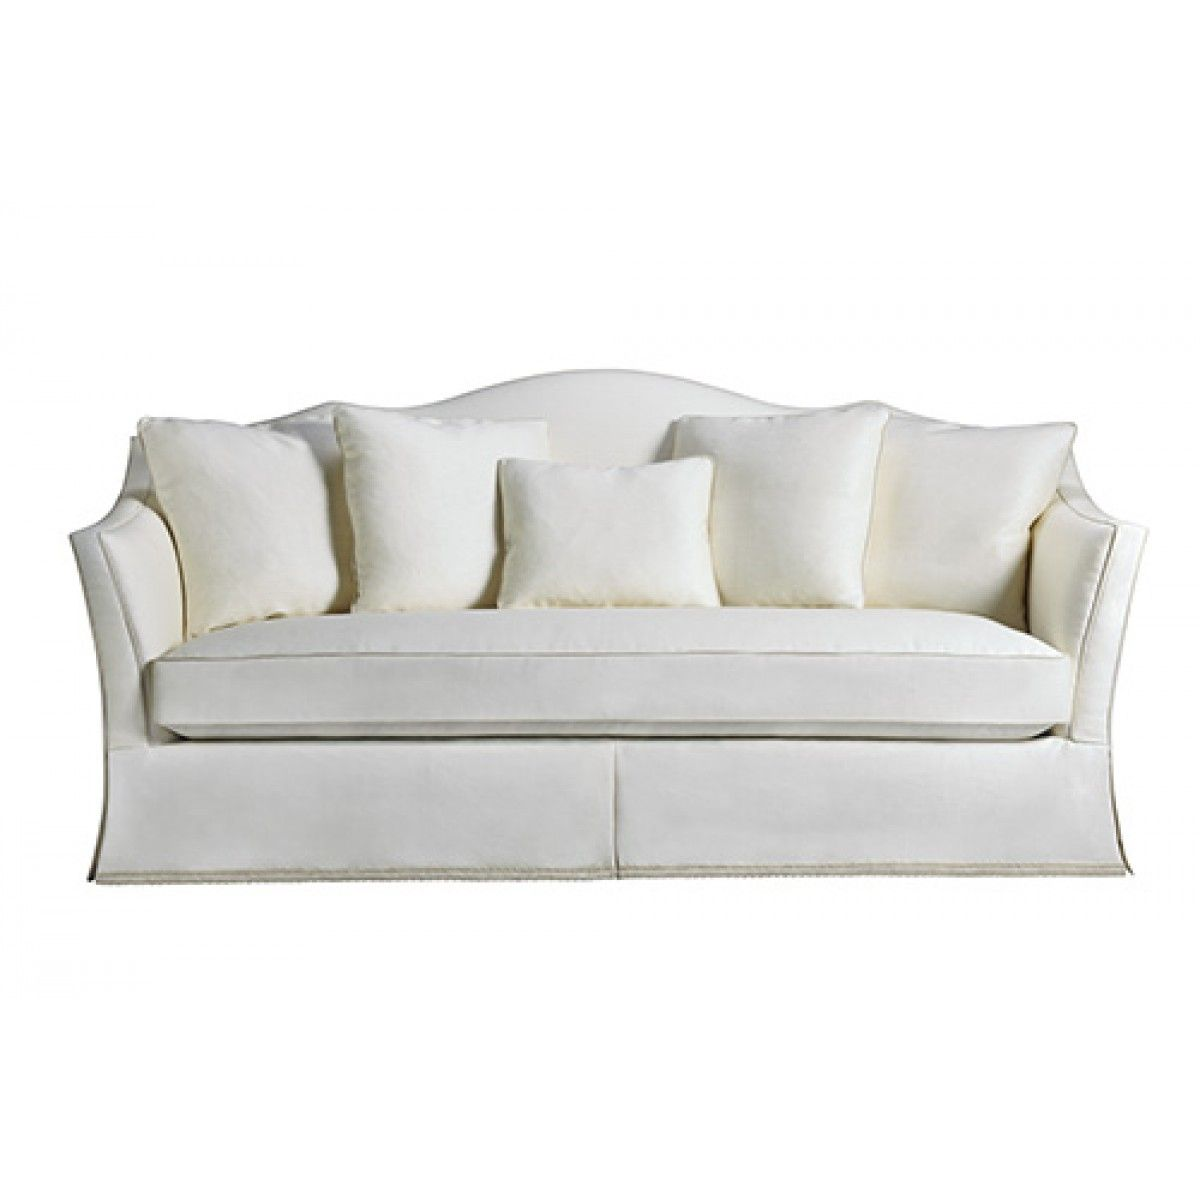 Baker Clics Camelback Sofa 6536s